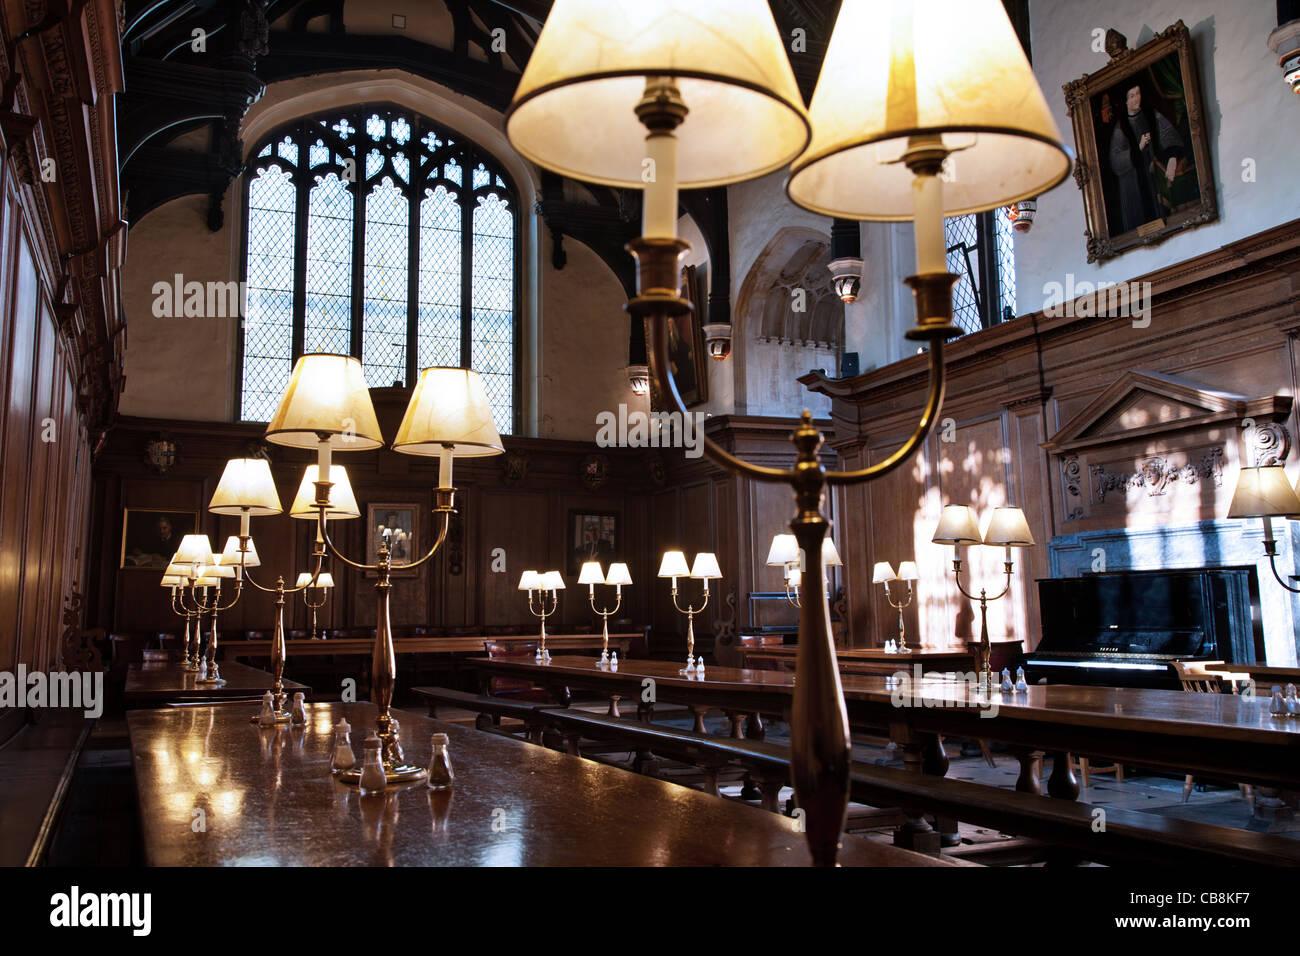 Corpus Christi College, Oxford, UK - Stock Image